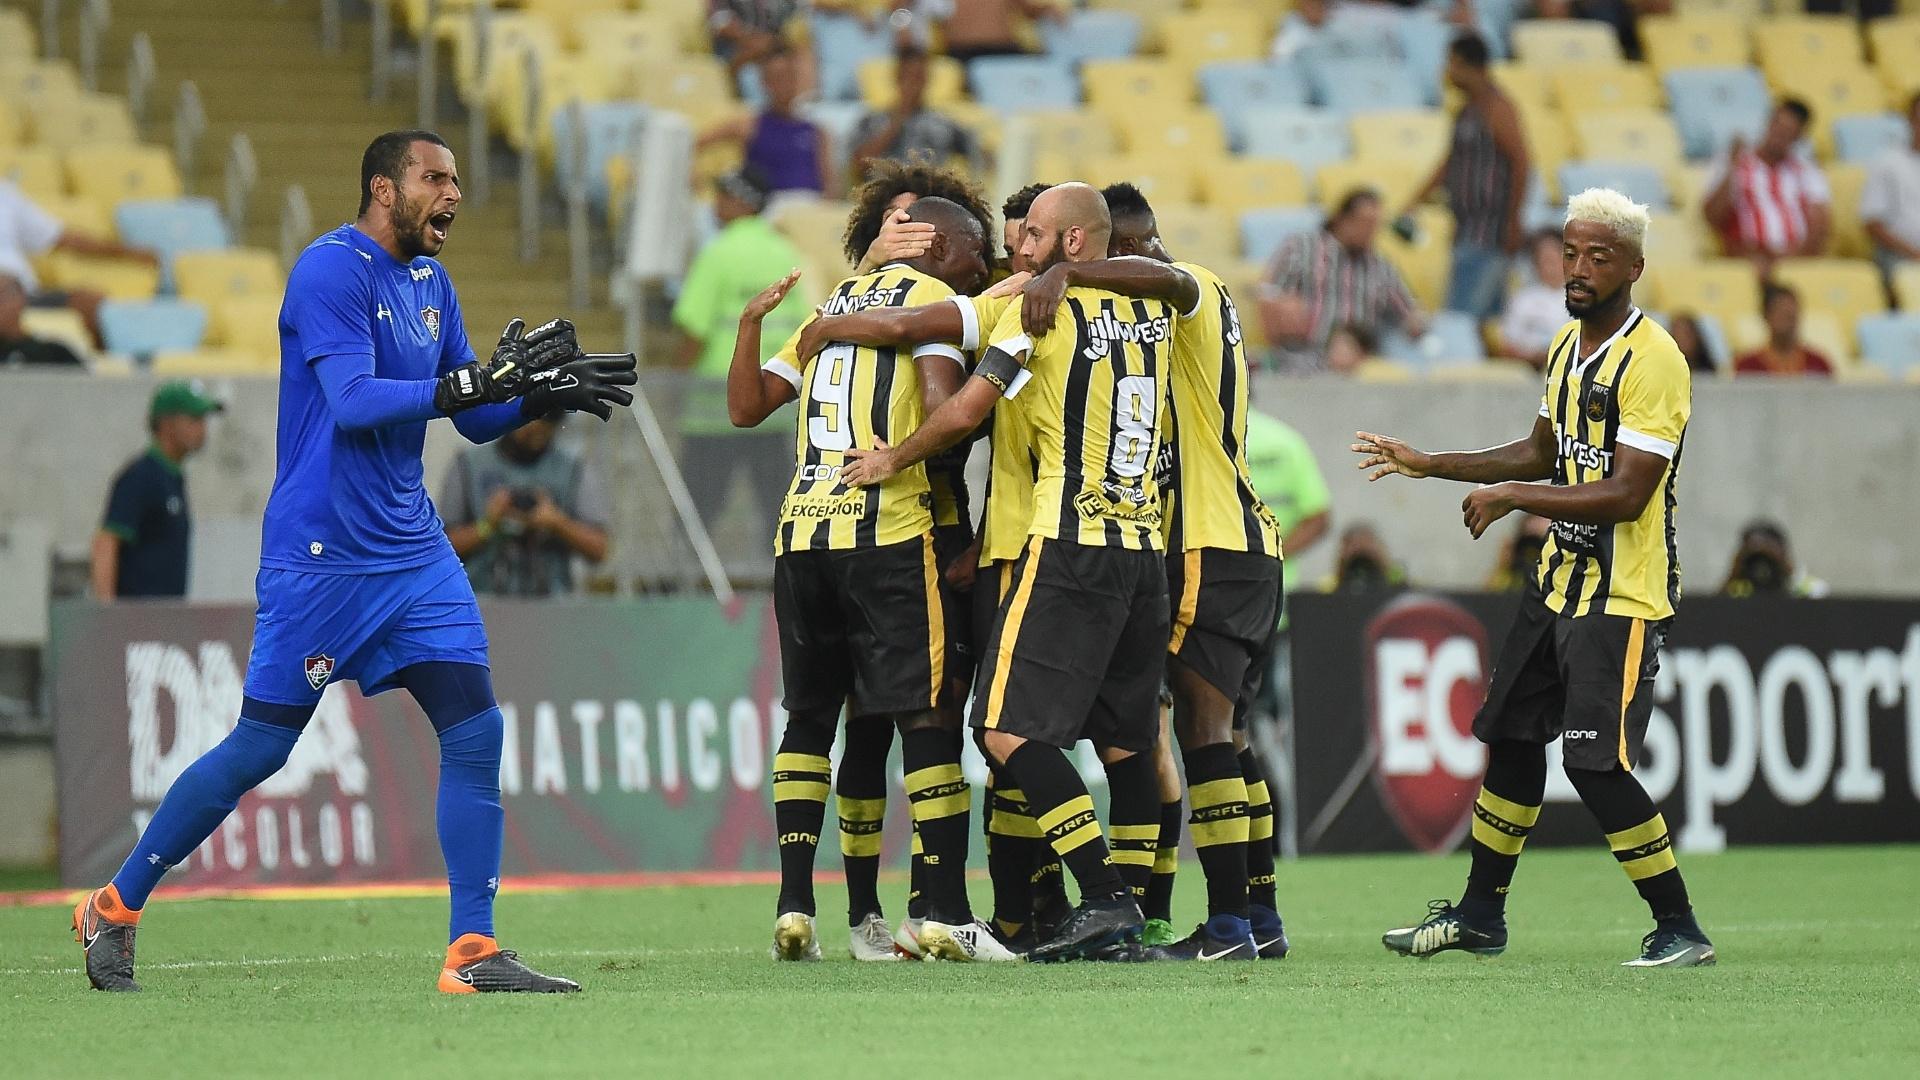 Jogadores do Volta Redonda comemoram gol sobre o Fluminense no Maracanã